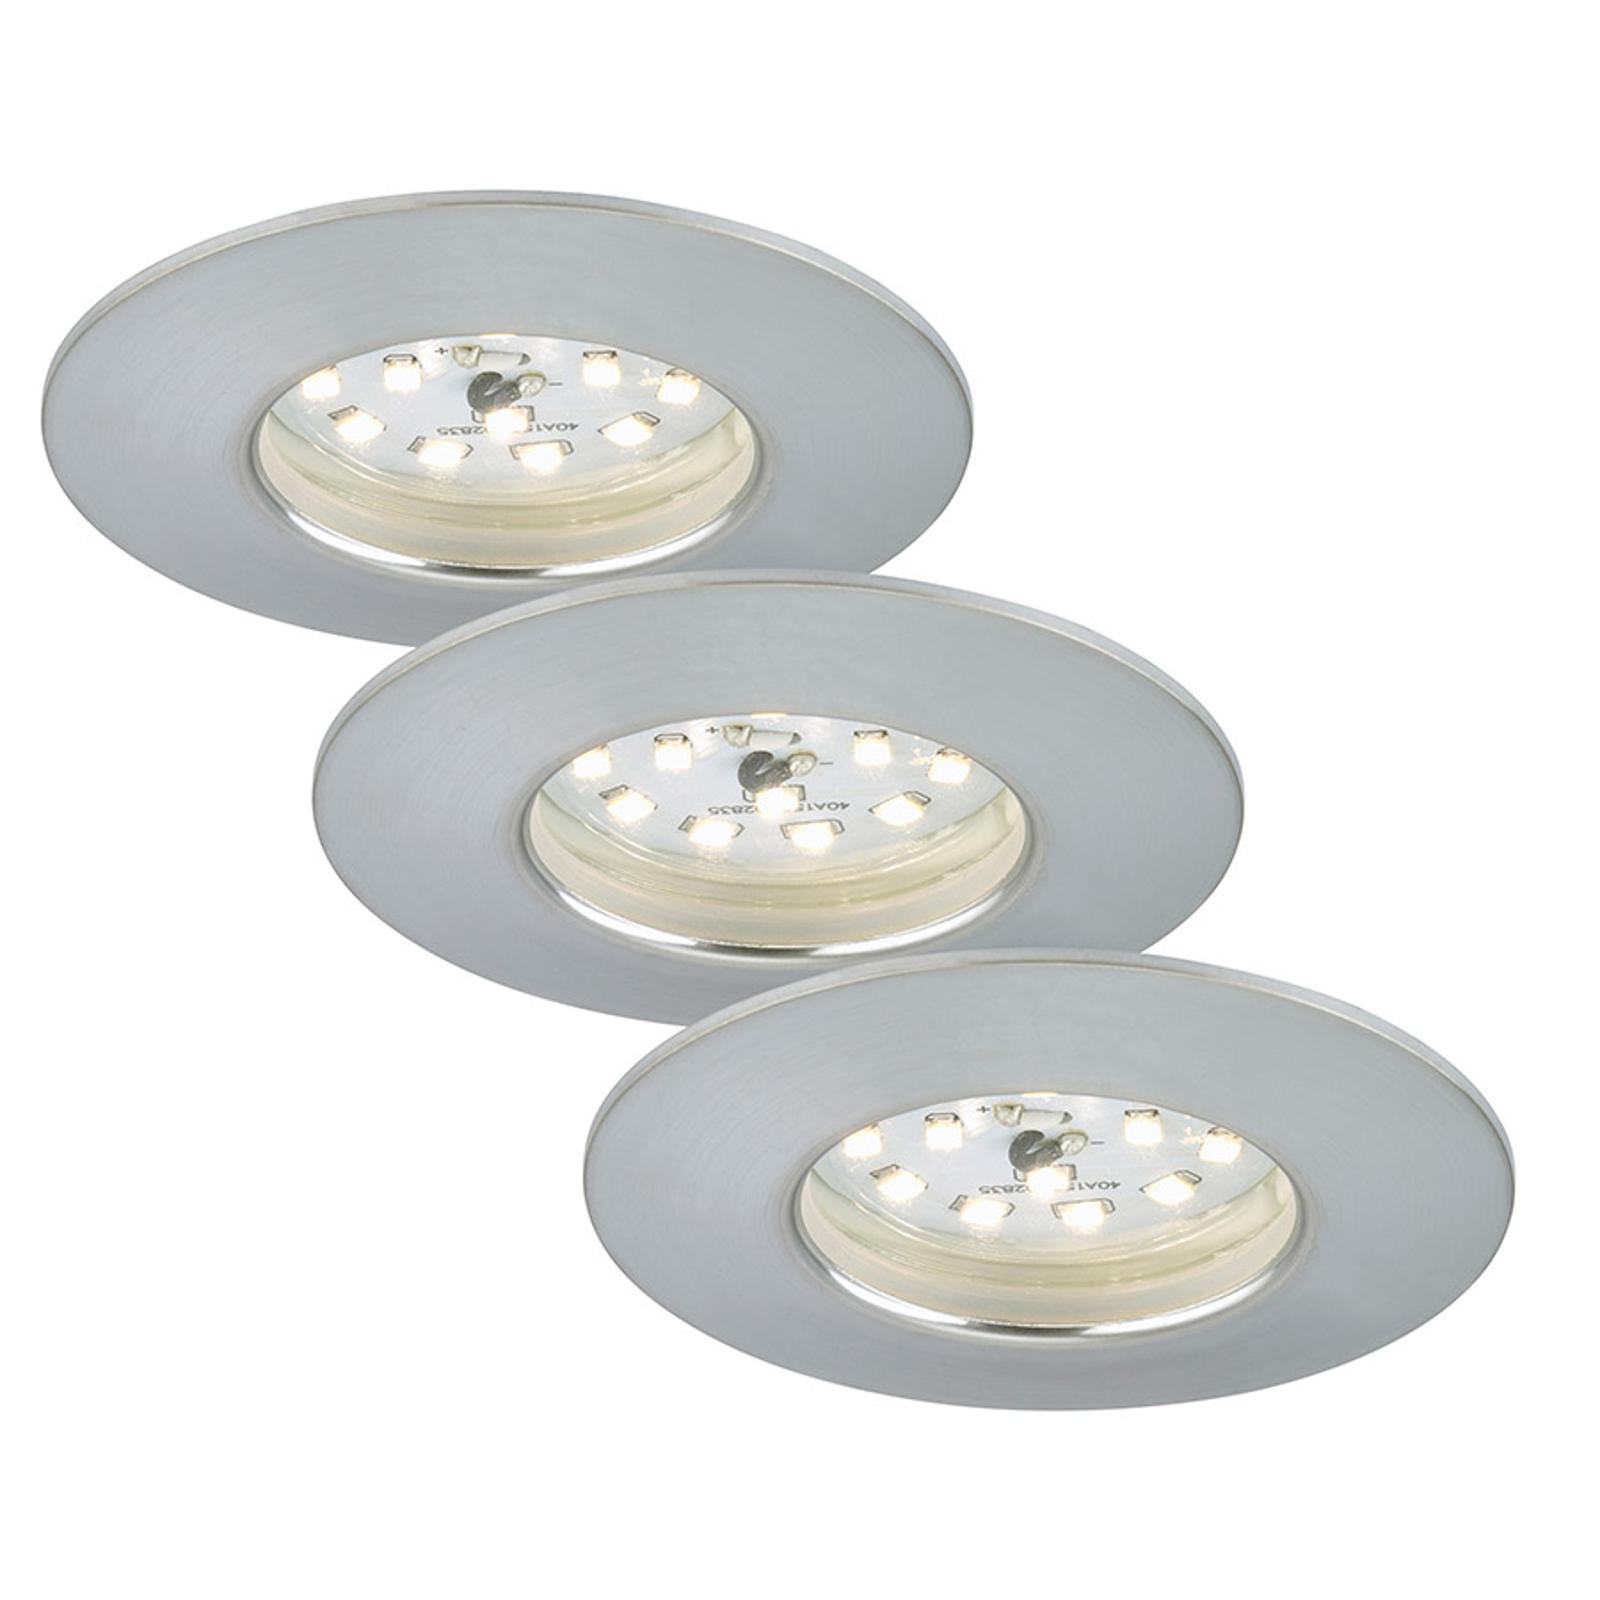 Felia LED indbygningslampe, alu, 3 stk.